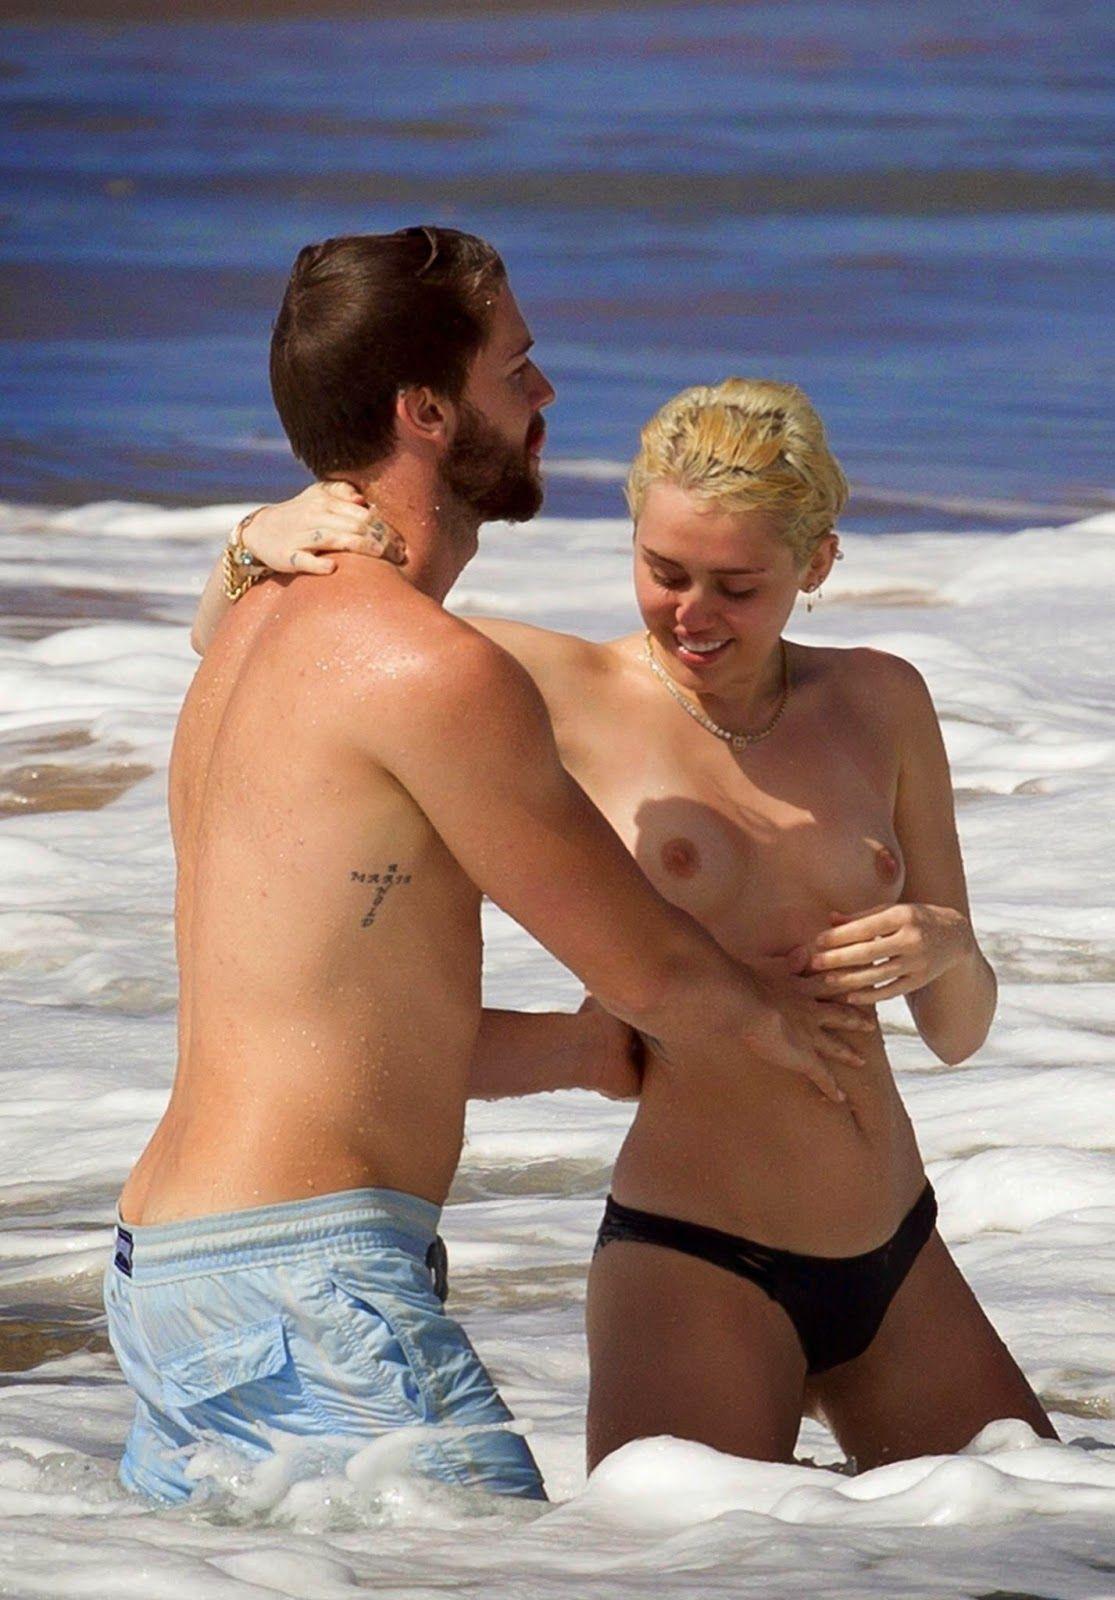 Miley Cyrus Naked At The Beach